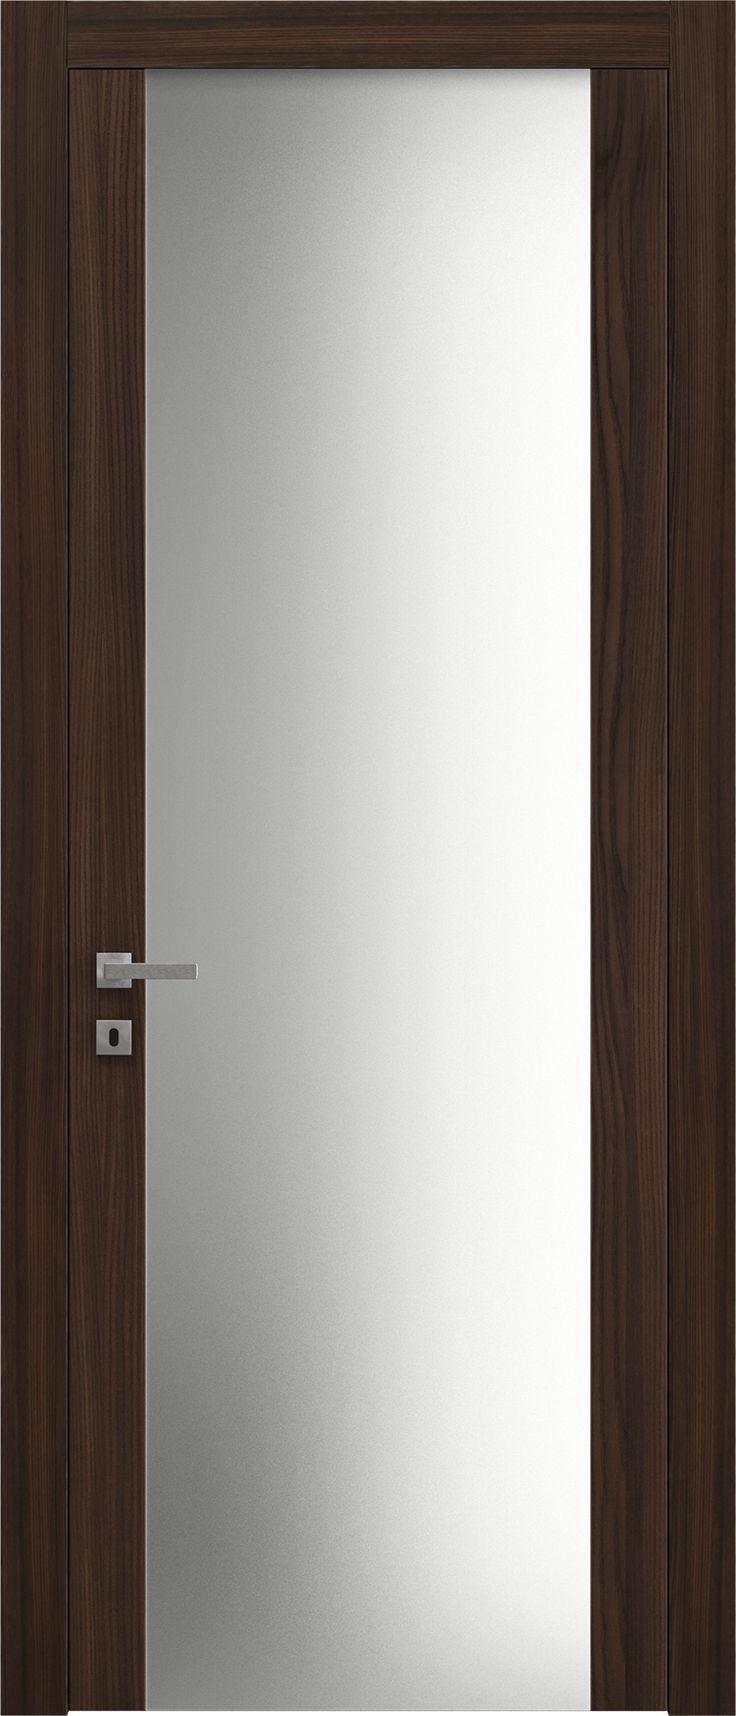 small reclaimed white bedroom photos of interior doors contemporary closet